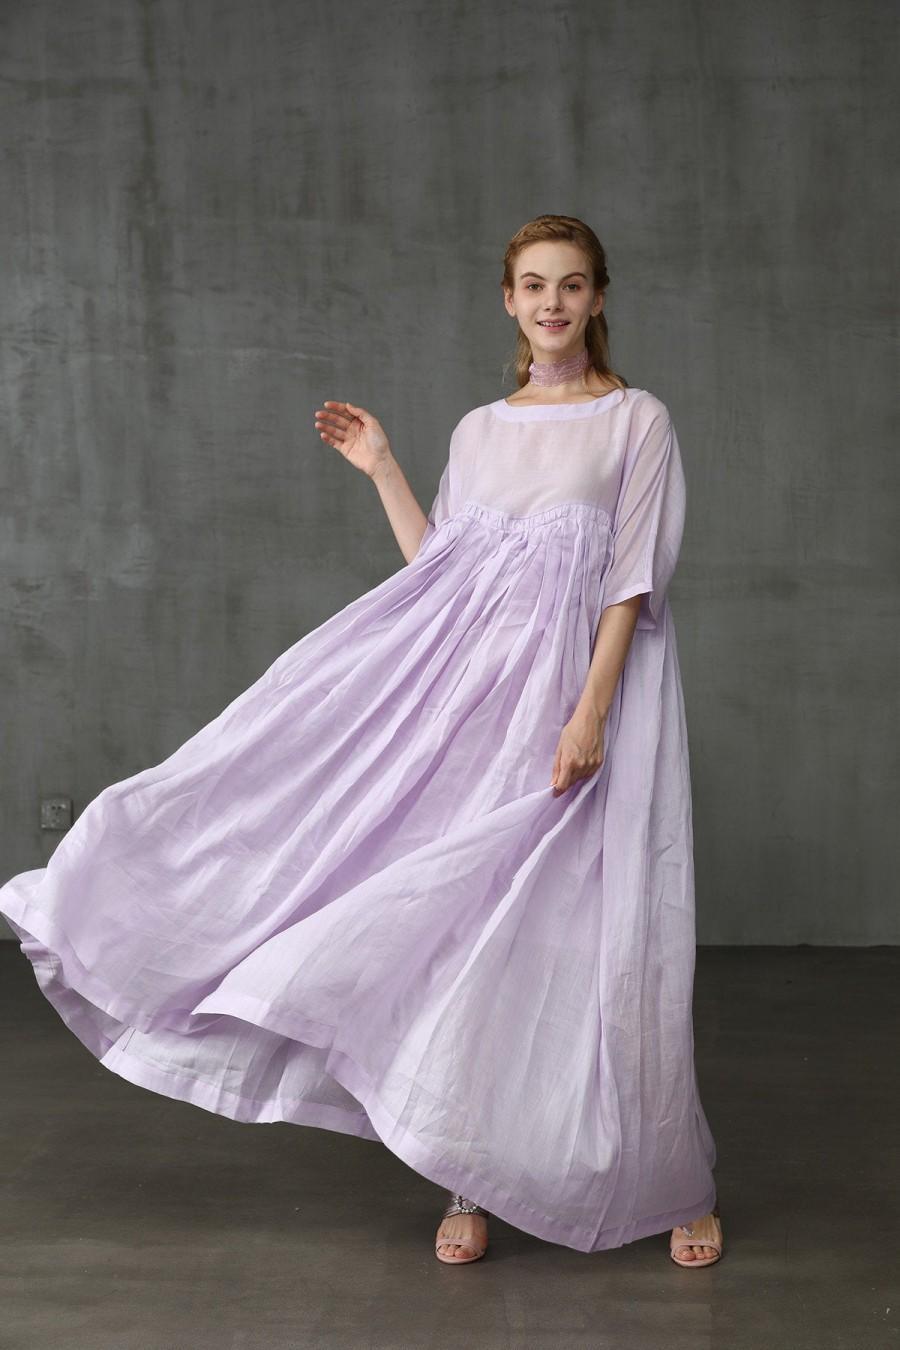 Wedding - linen dress, maxi dress in lilac, aqua and yellow, maxi wedding dress, bridal dress, lilac dress, cocktail dress